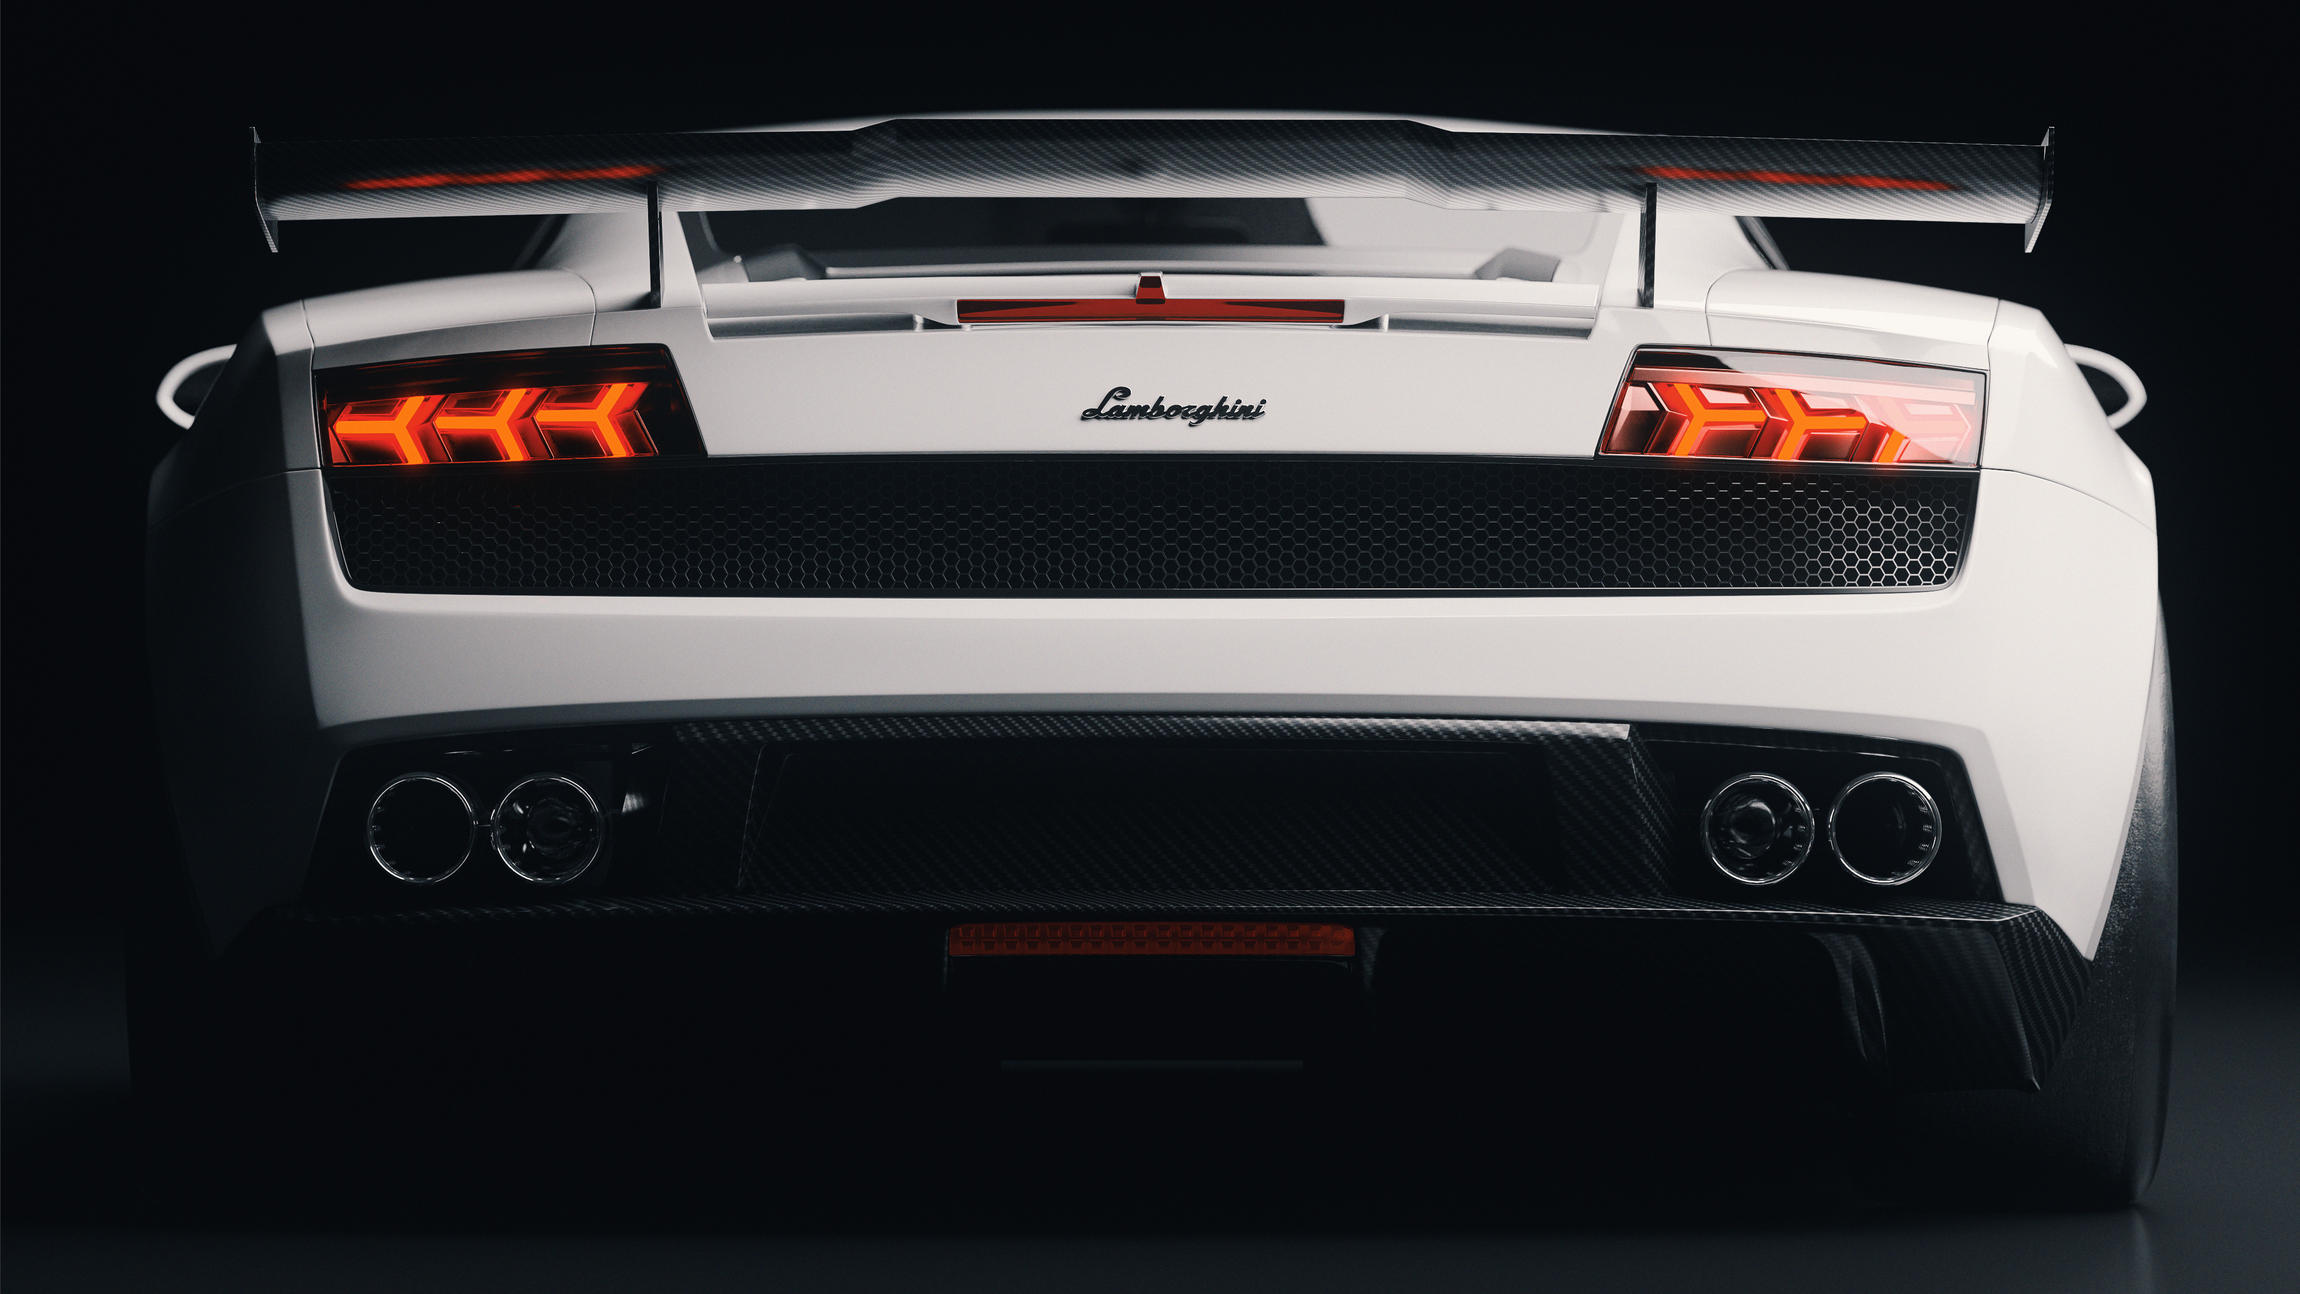 Lamborghini Gallardo Studio Shots Finished Projects Blender